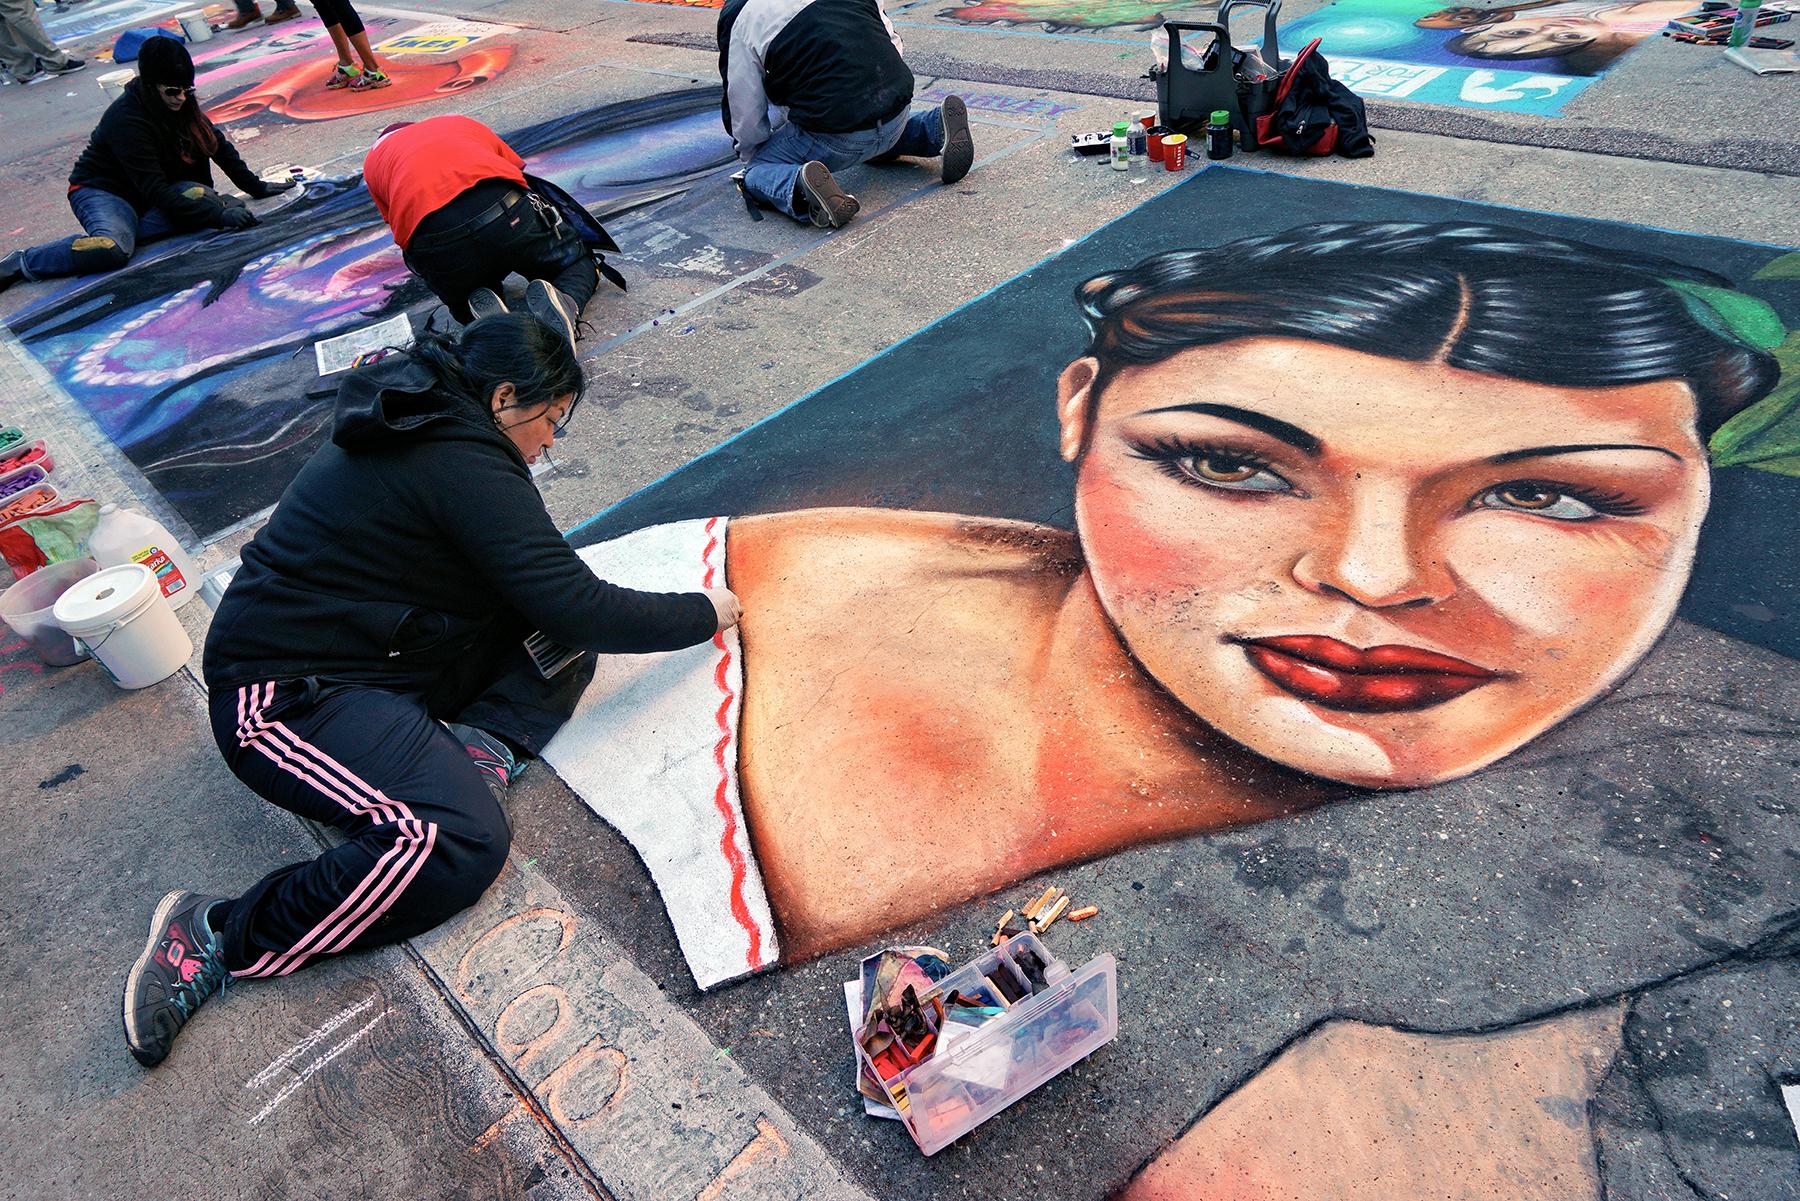 Alba Amezcua at 2015 Houston Via Colori